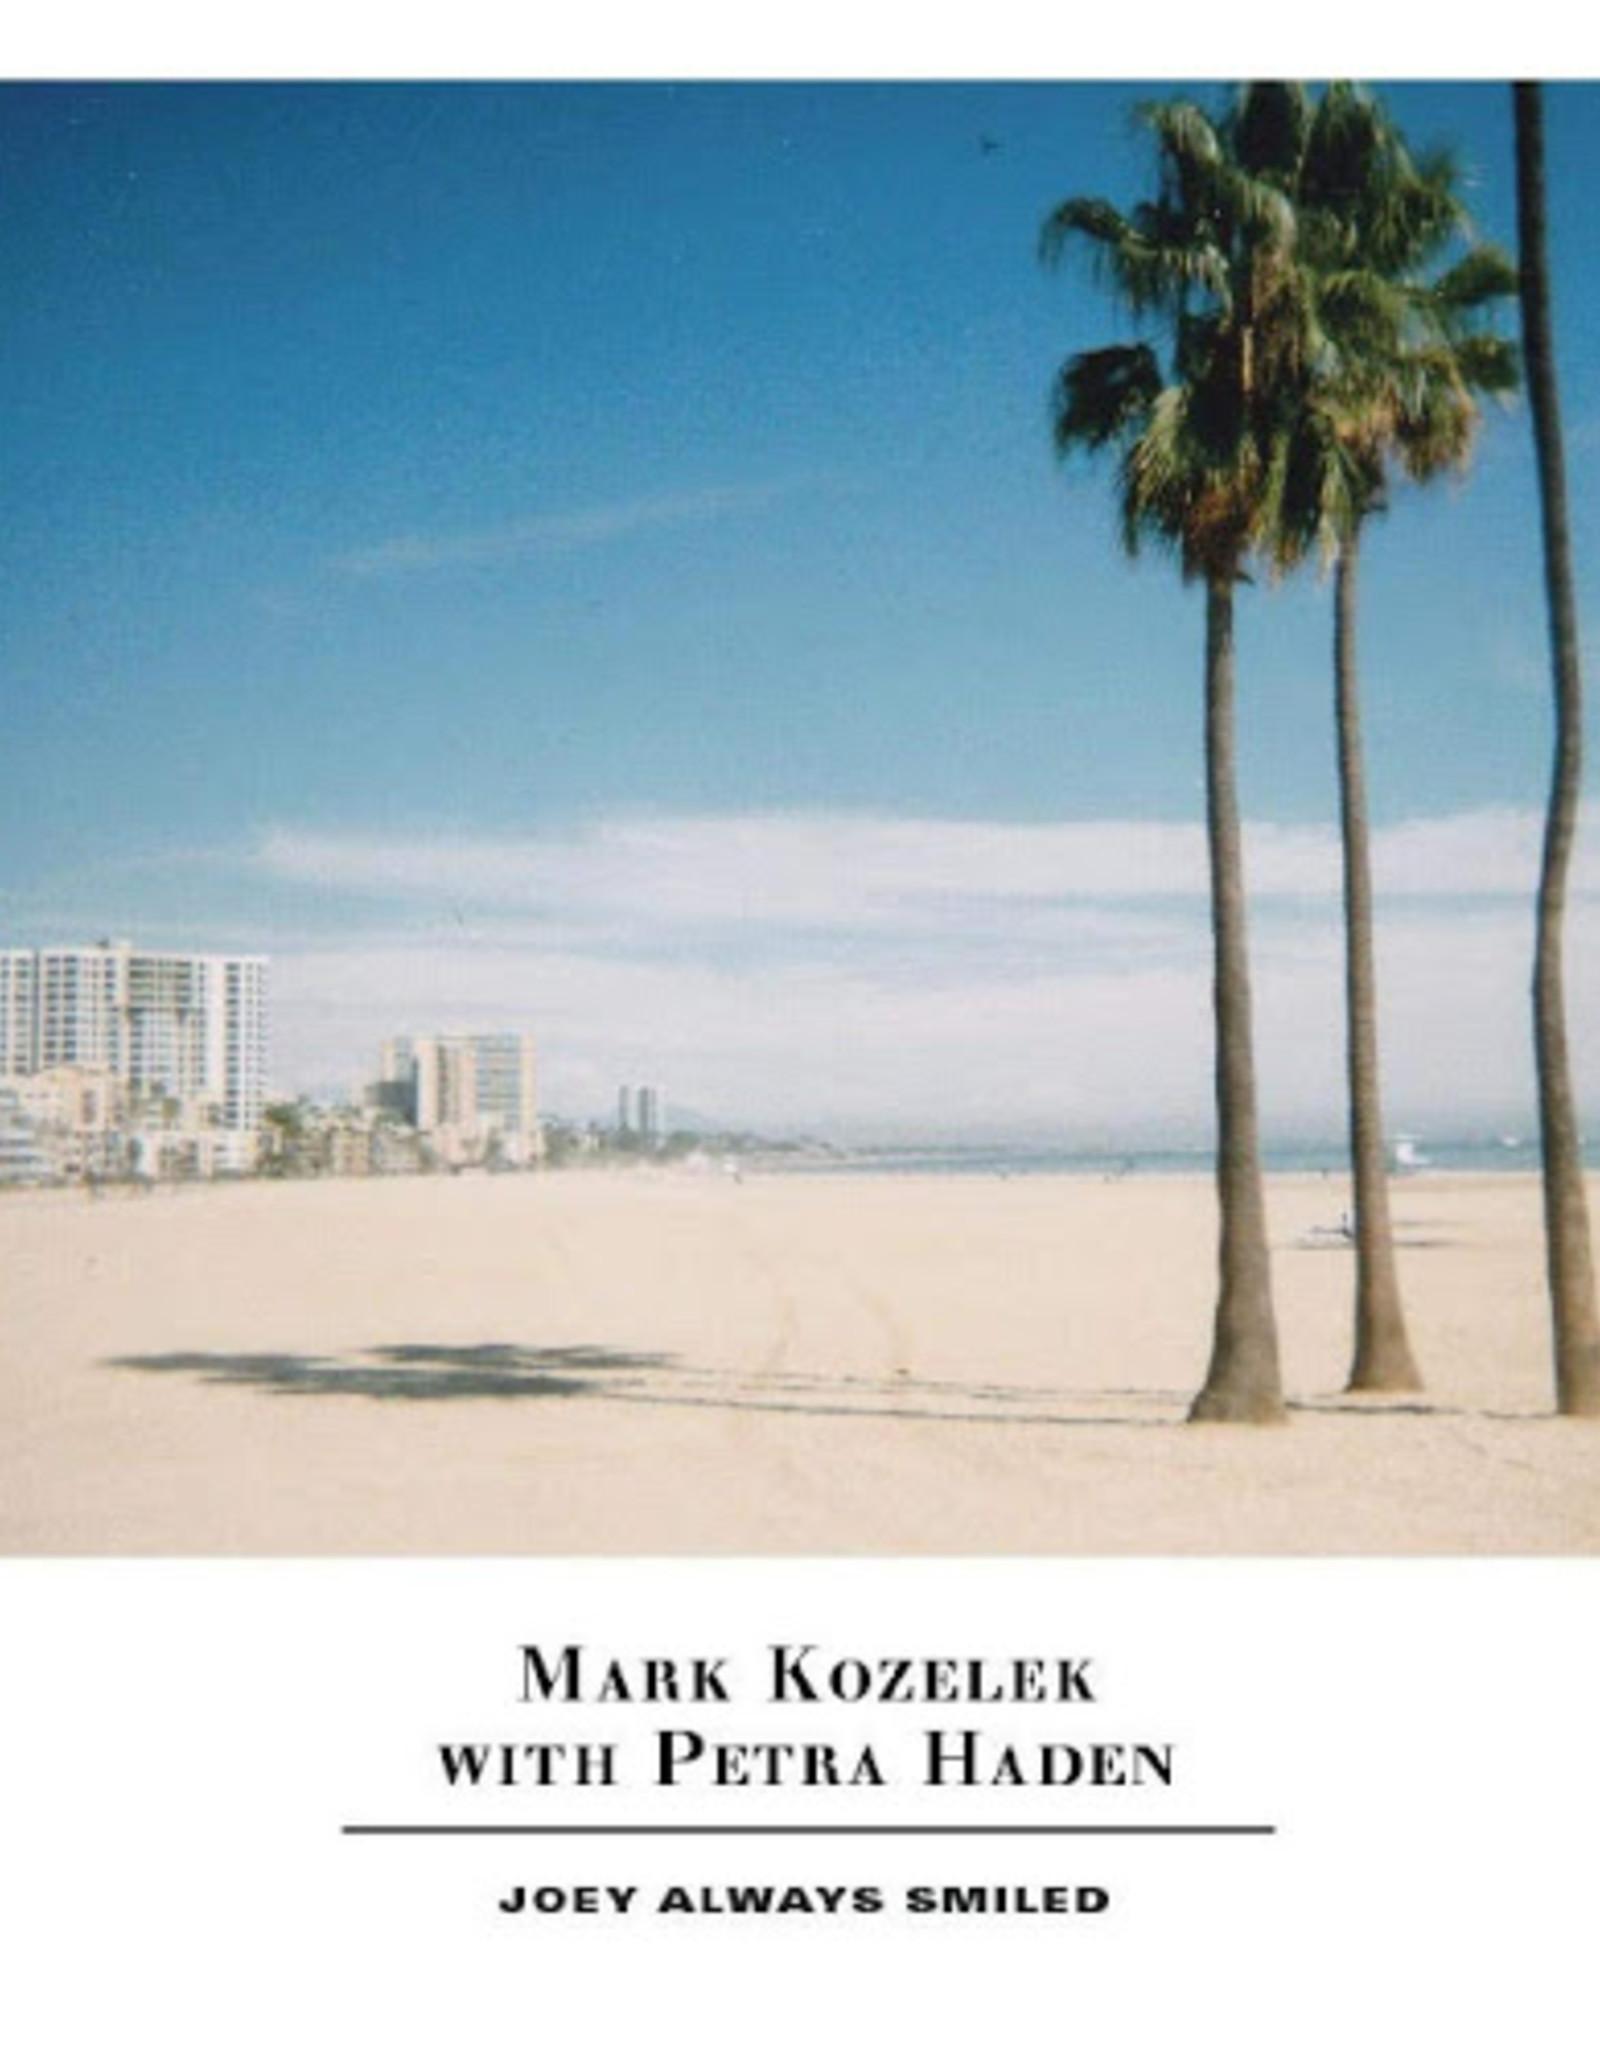 Mark Kozelek And Petra Haden - Joey Always Smiled